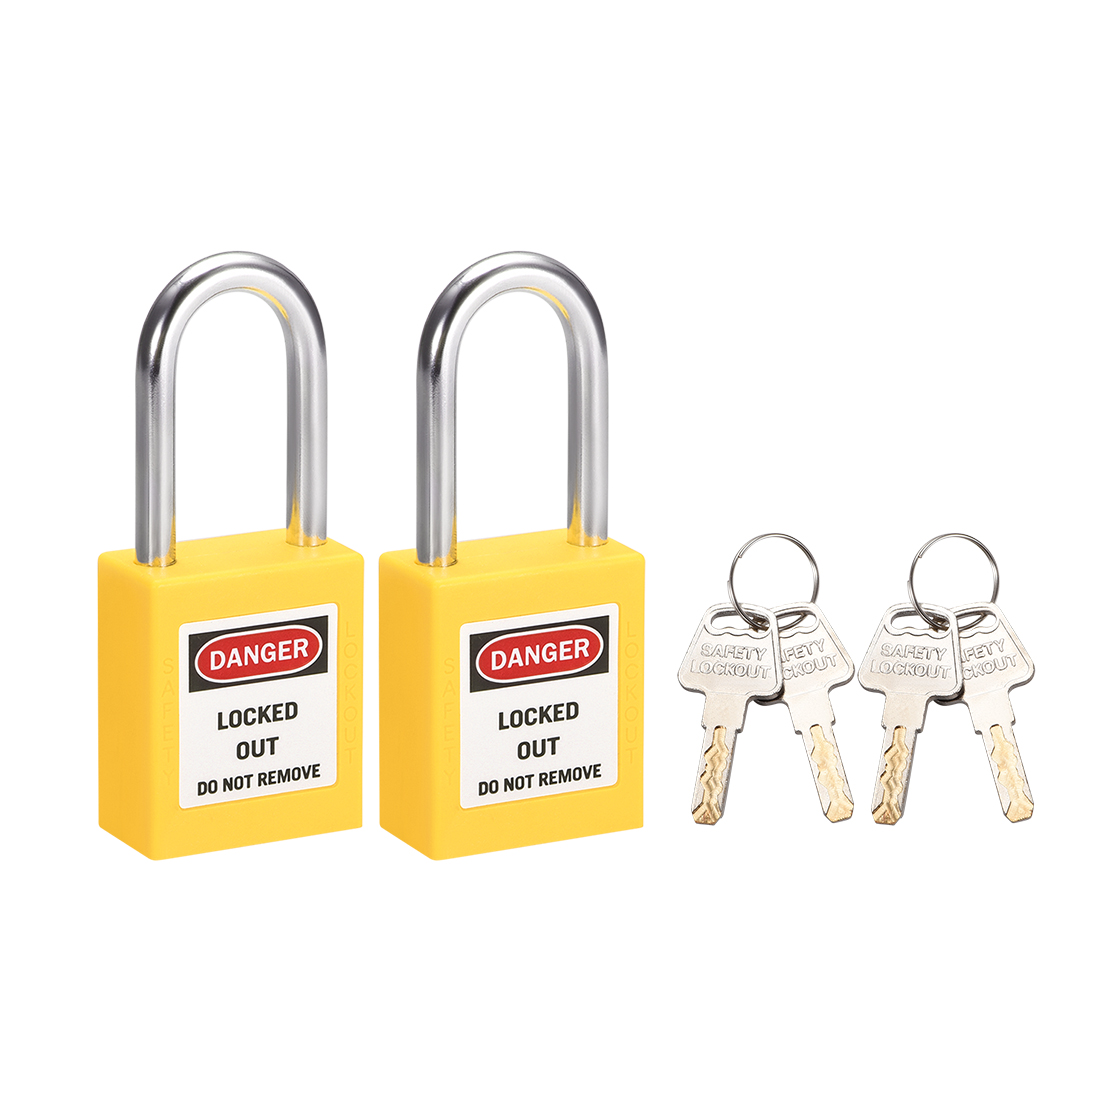 Lockout Tagout Locks 1-1/2 Inch Shackle Key Different Padlock Yellow 2 Pcs